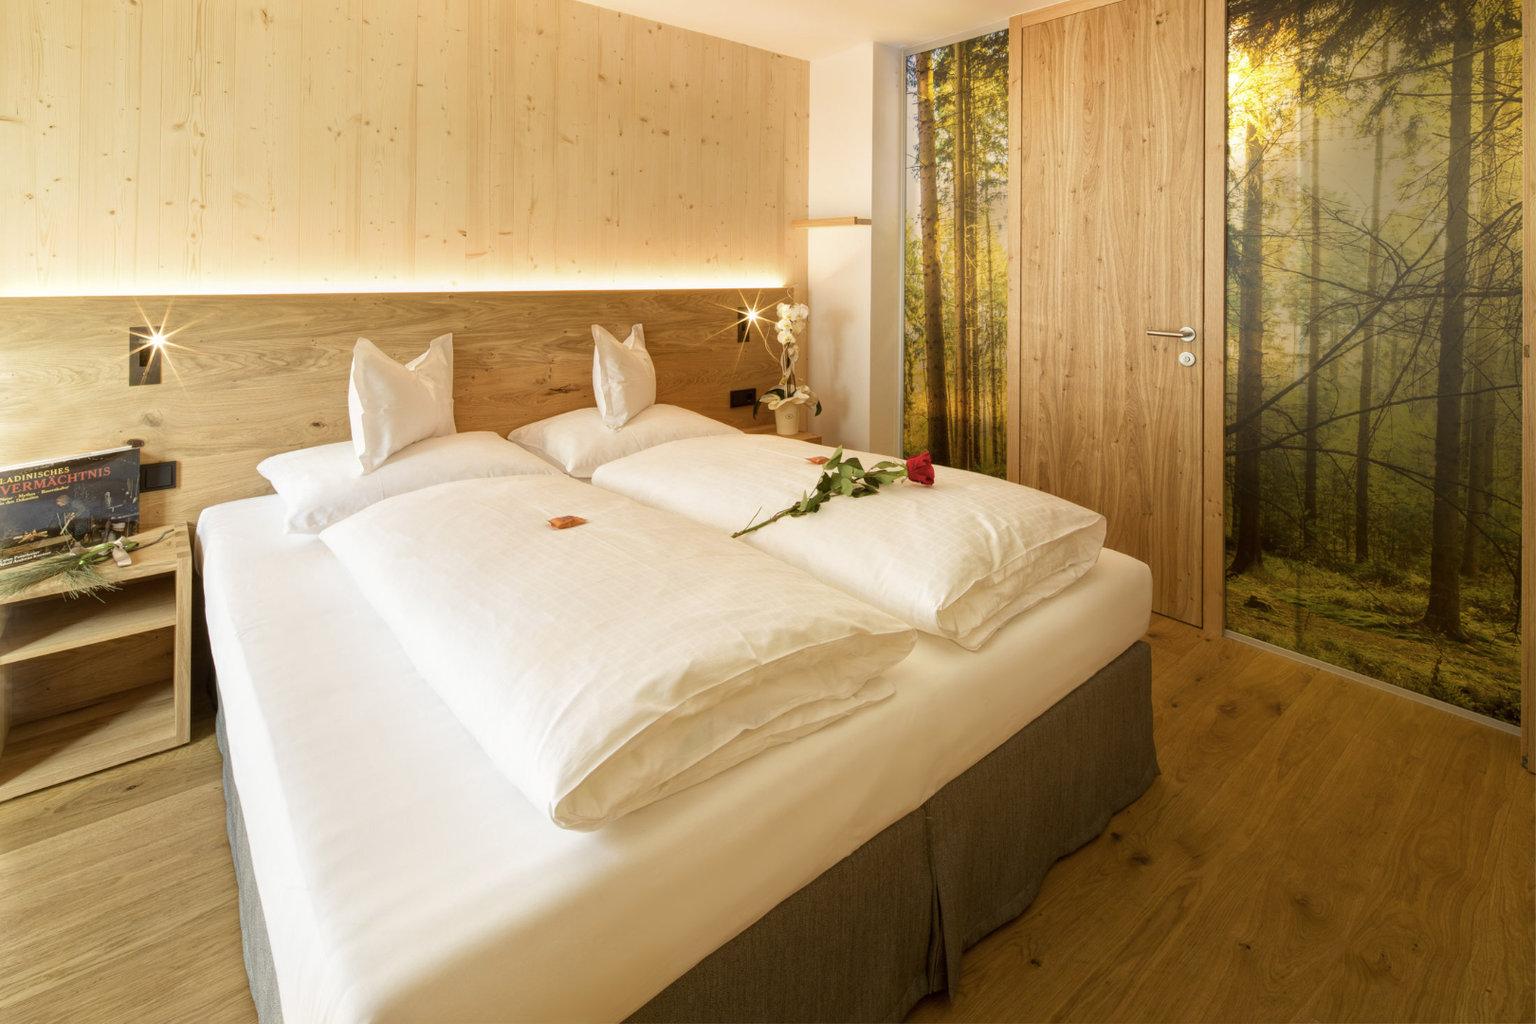 Eden selva mountain design hotel alfred tschager photography for Design hotel wolkenstein